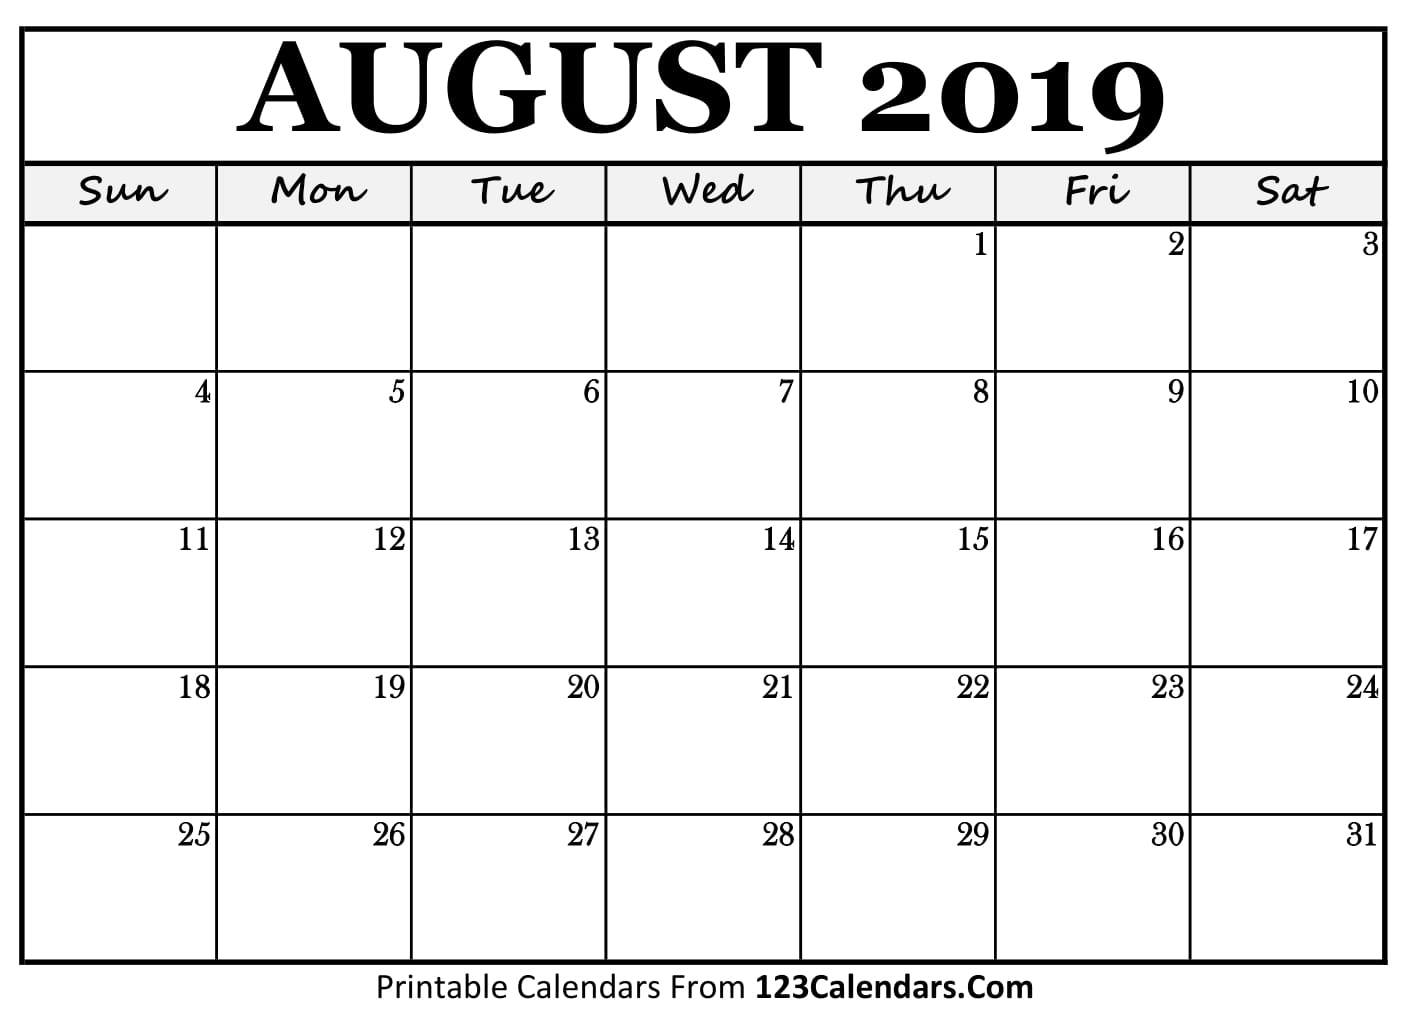 August 2019 Printable Calendar | 123Calendars throughout August Calendar Template With Notes